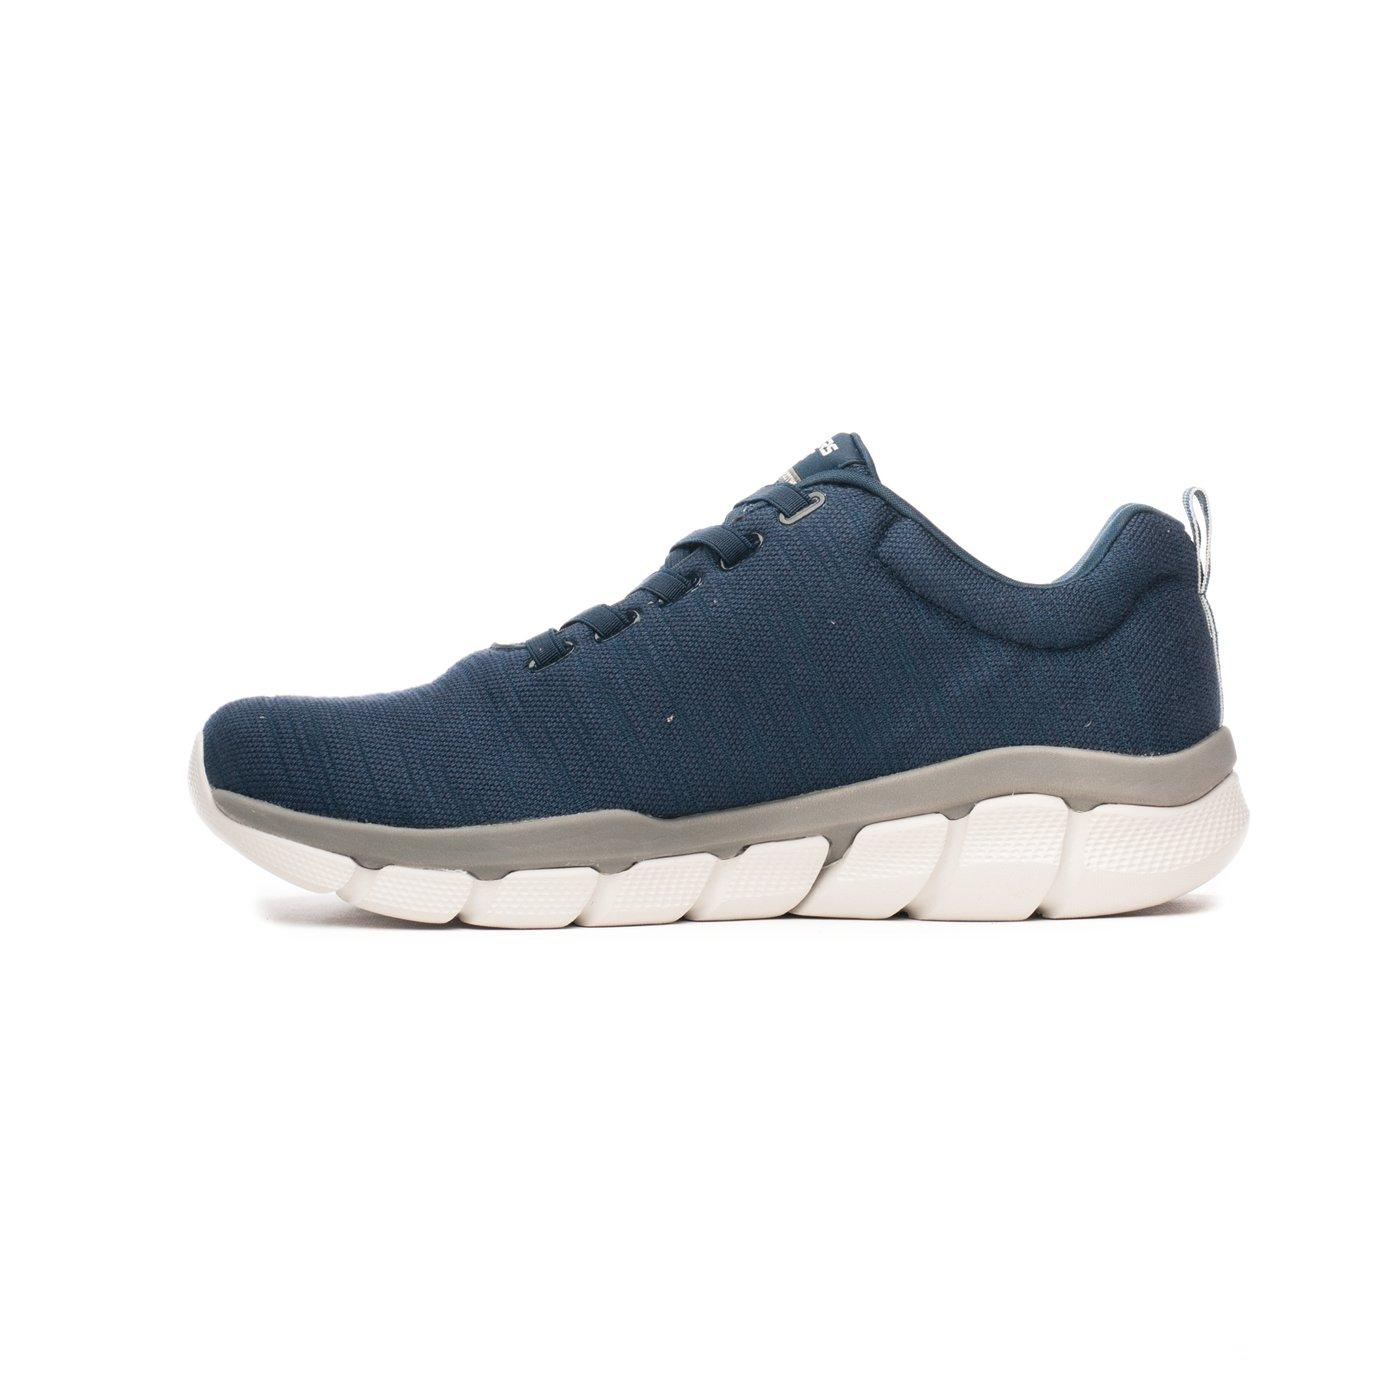 Кросівки чоловічі Skechers SKECH-FLEX